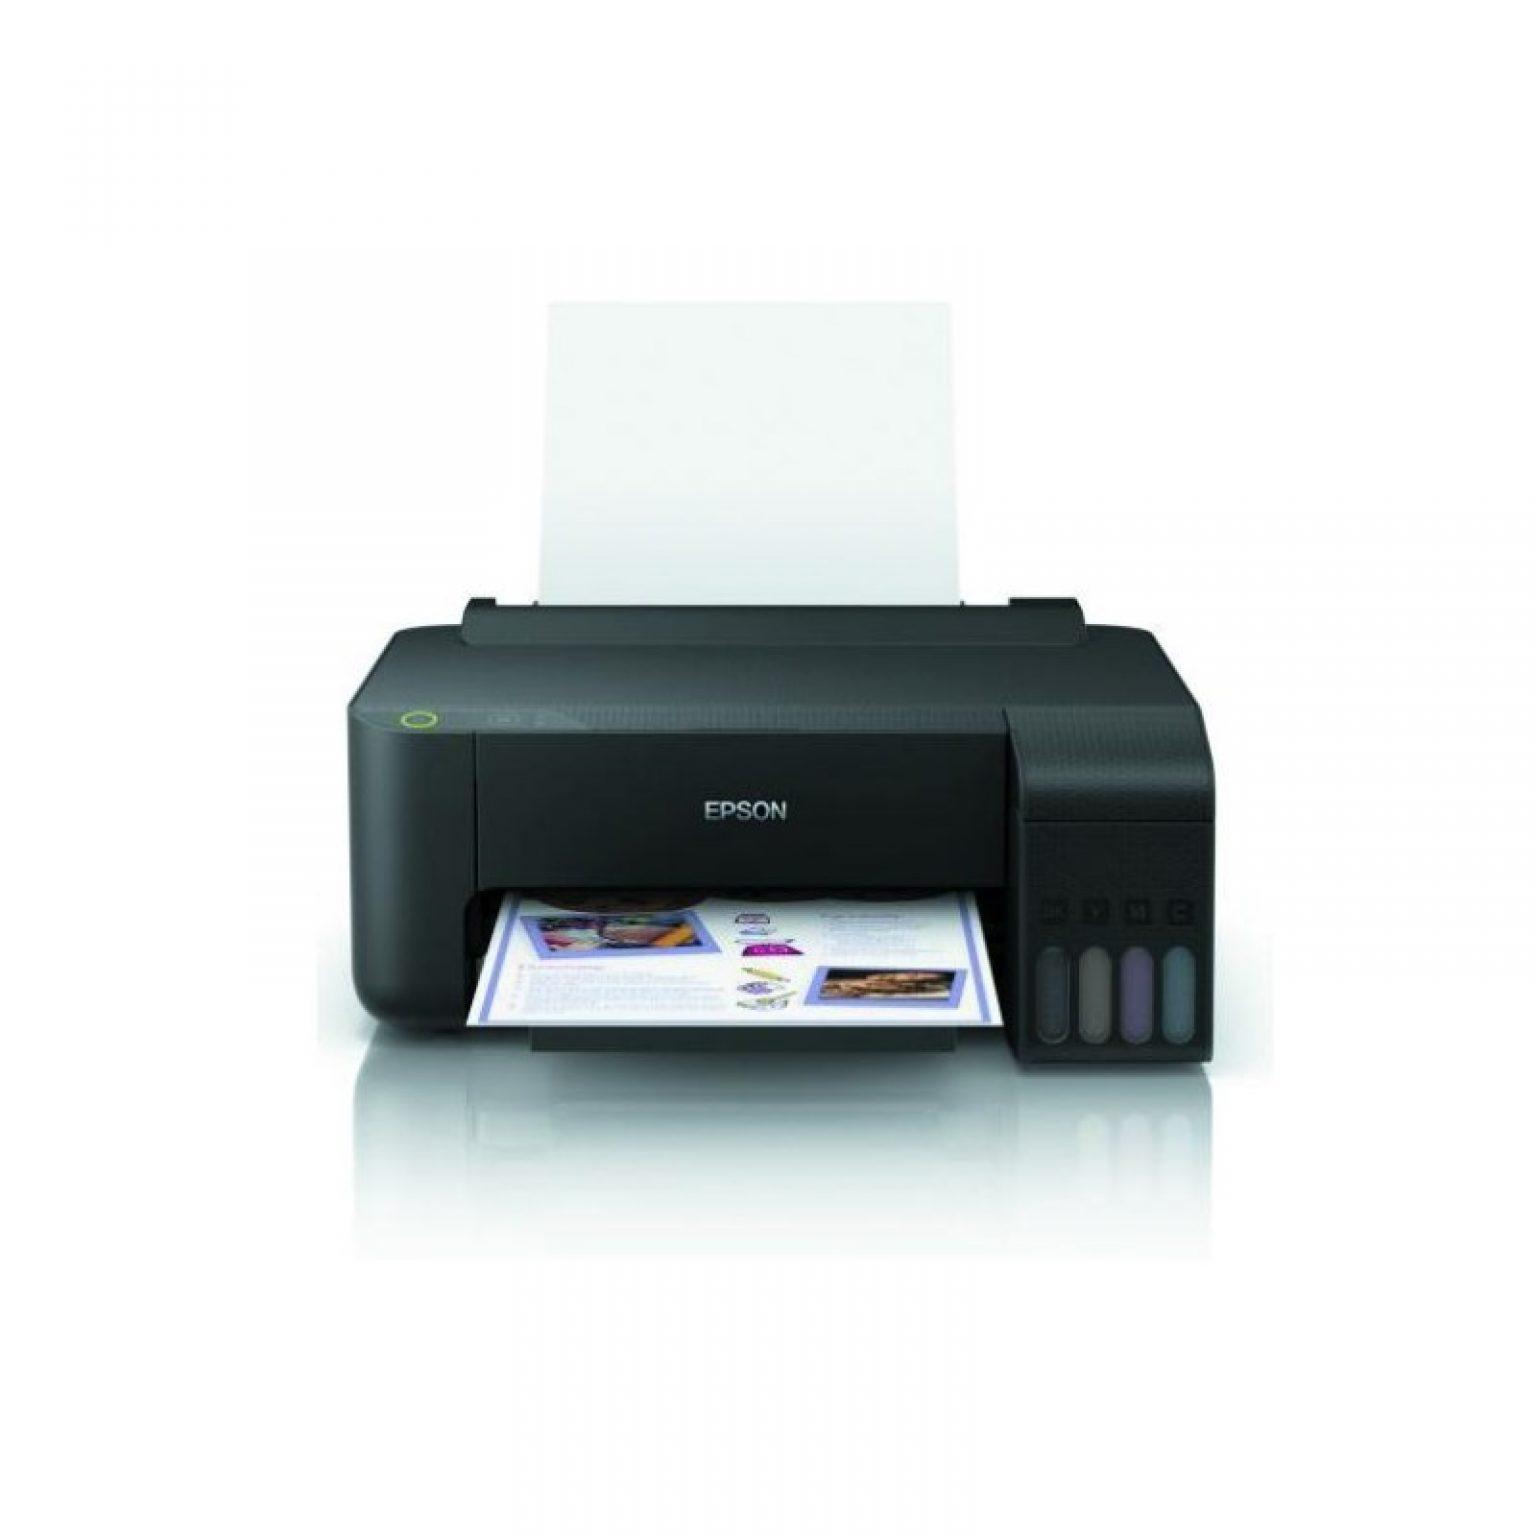 EPSON - Printer L1110